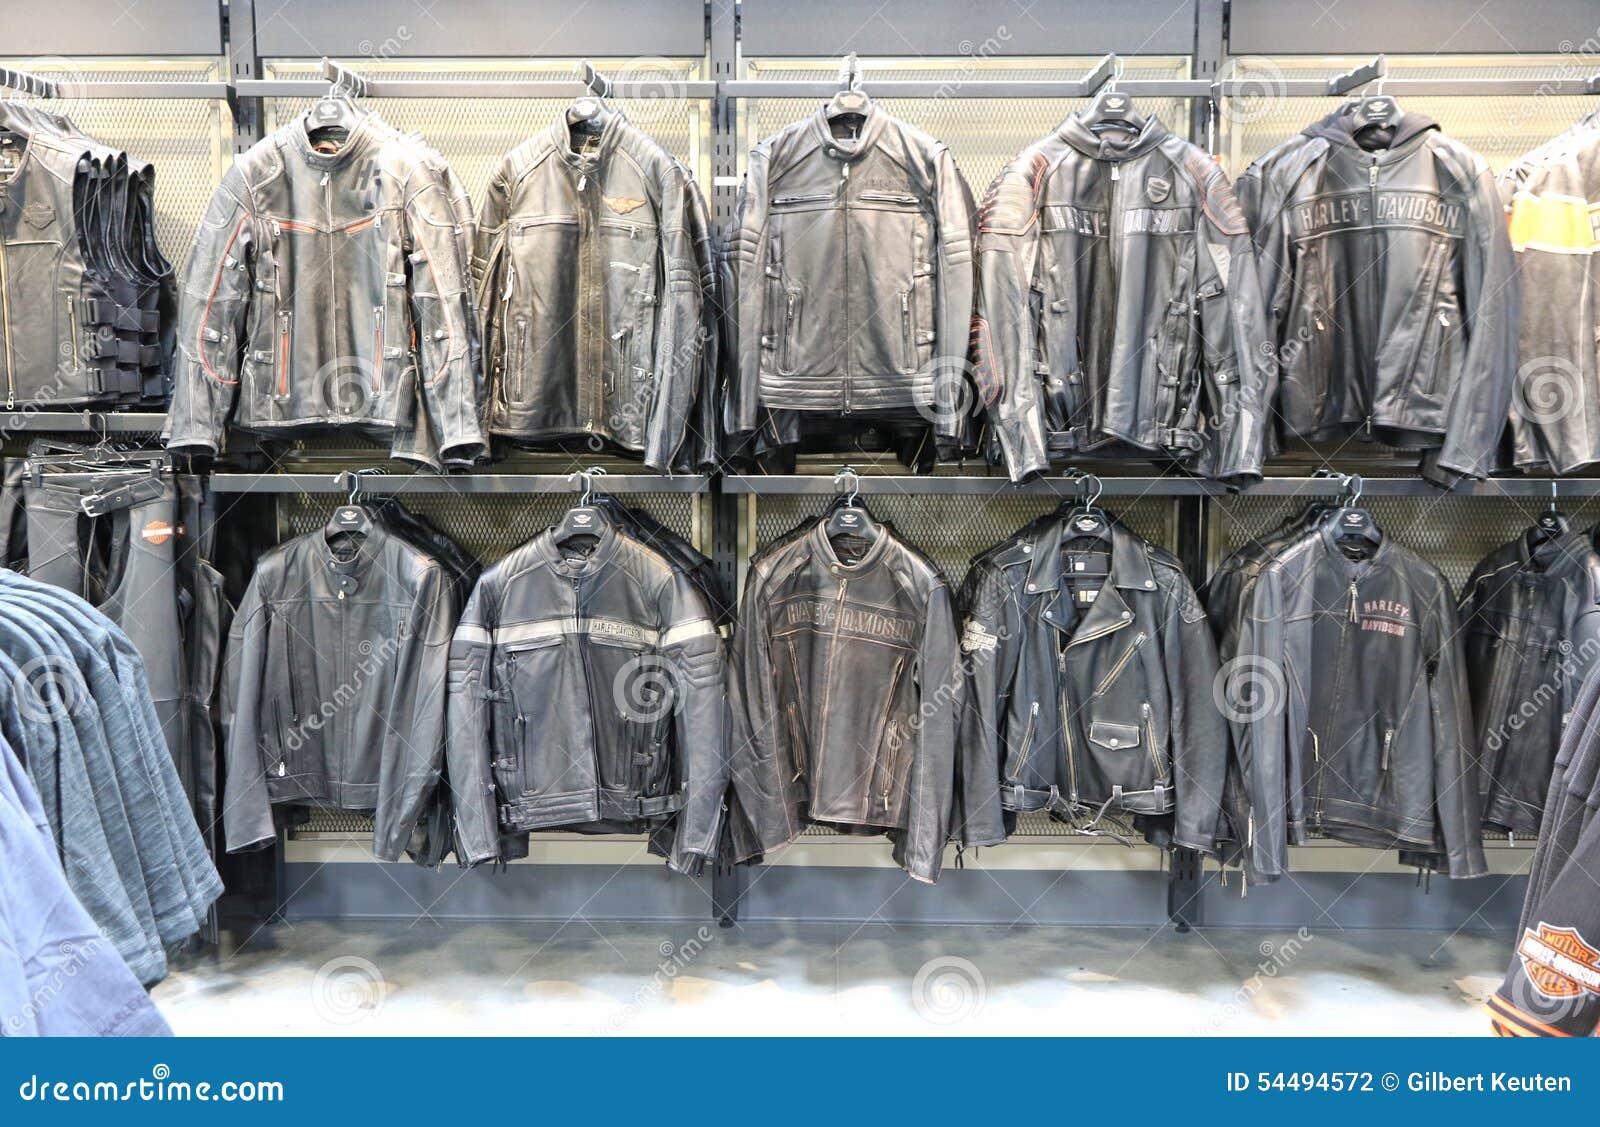 Harley Davidson Leather Jackets Editorial Photography - Image